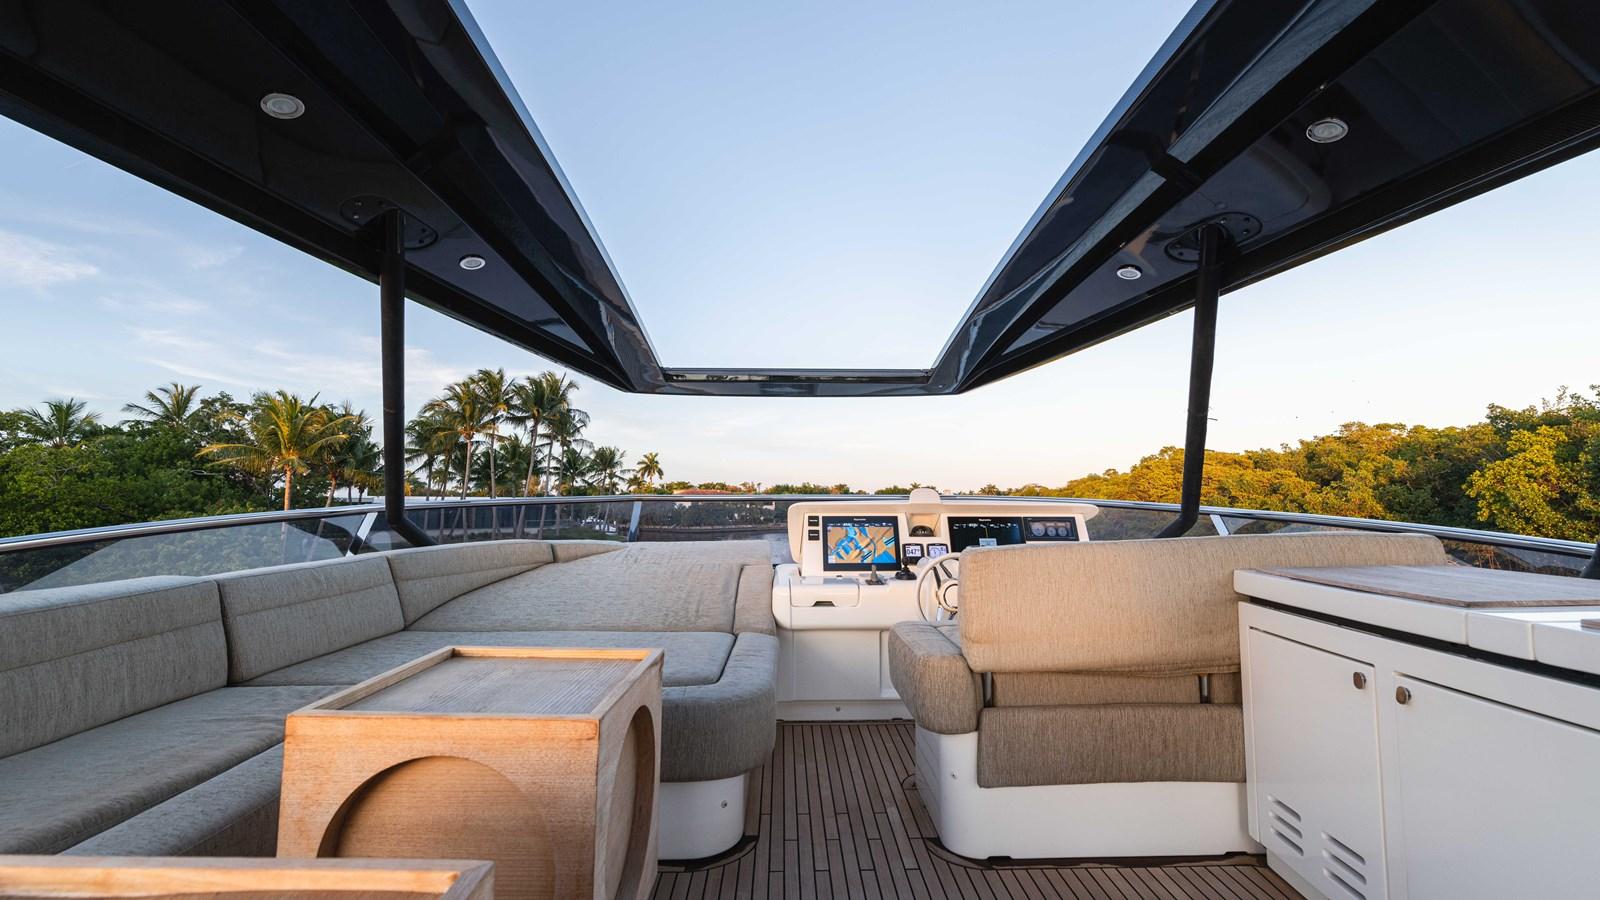 76 Monte Carlo (88 of 127) 2014 MONTE CARLO YACHTS Motoryacht Motor Yacht 2825114